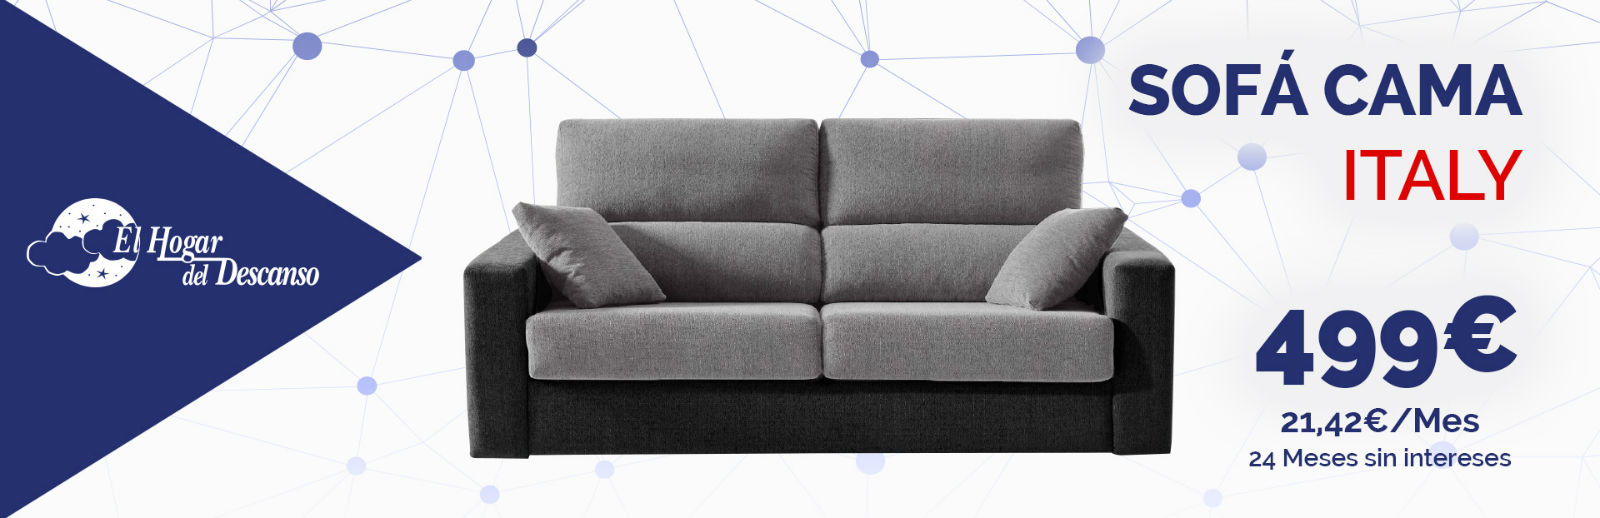 Colch n flex y sof cama apertura italiana tiendas de for Colchones para sofa cama dos plazas